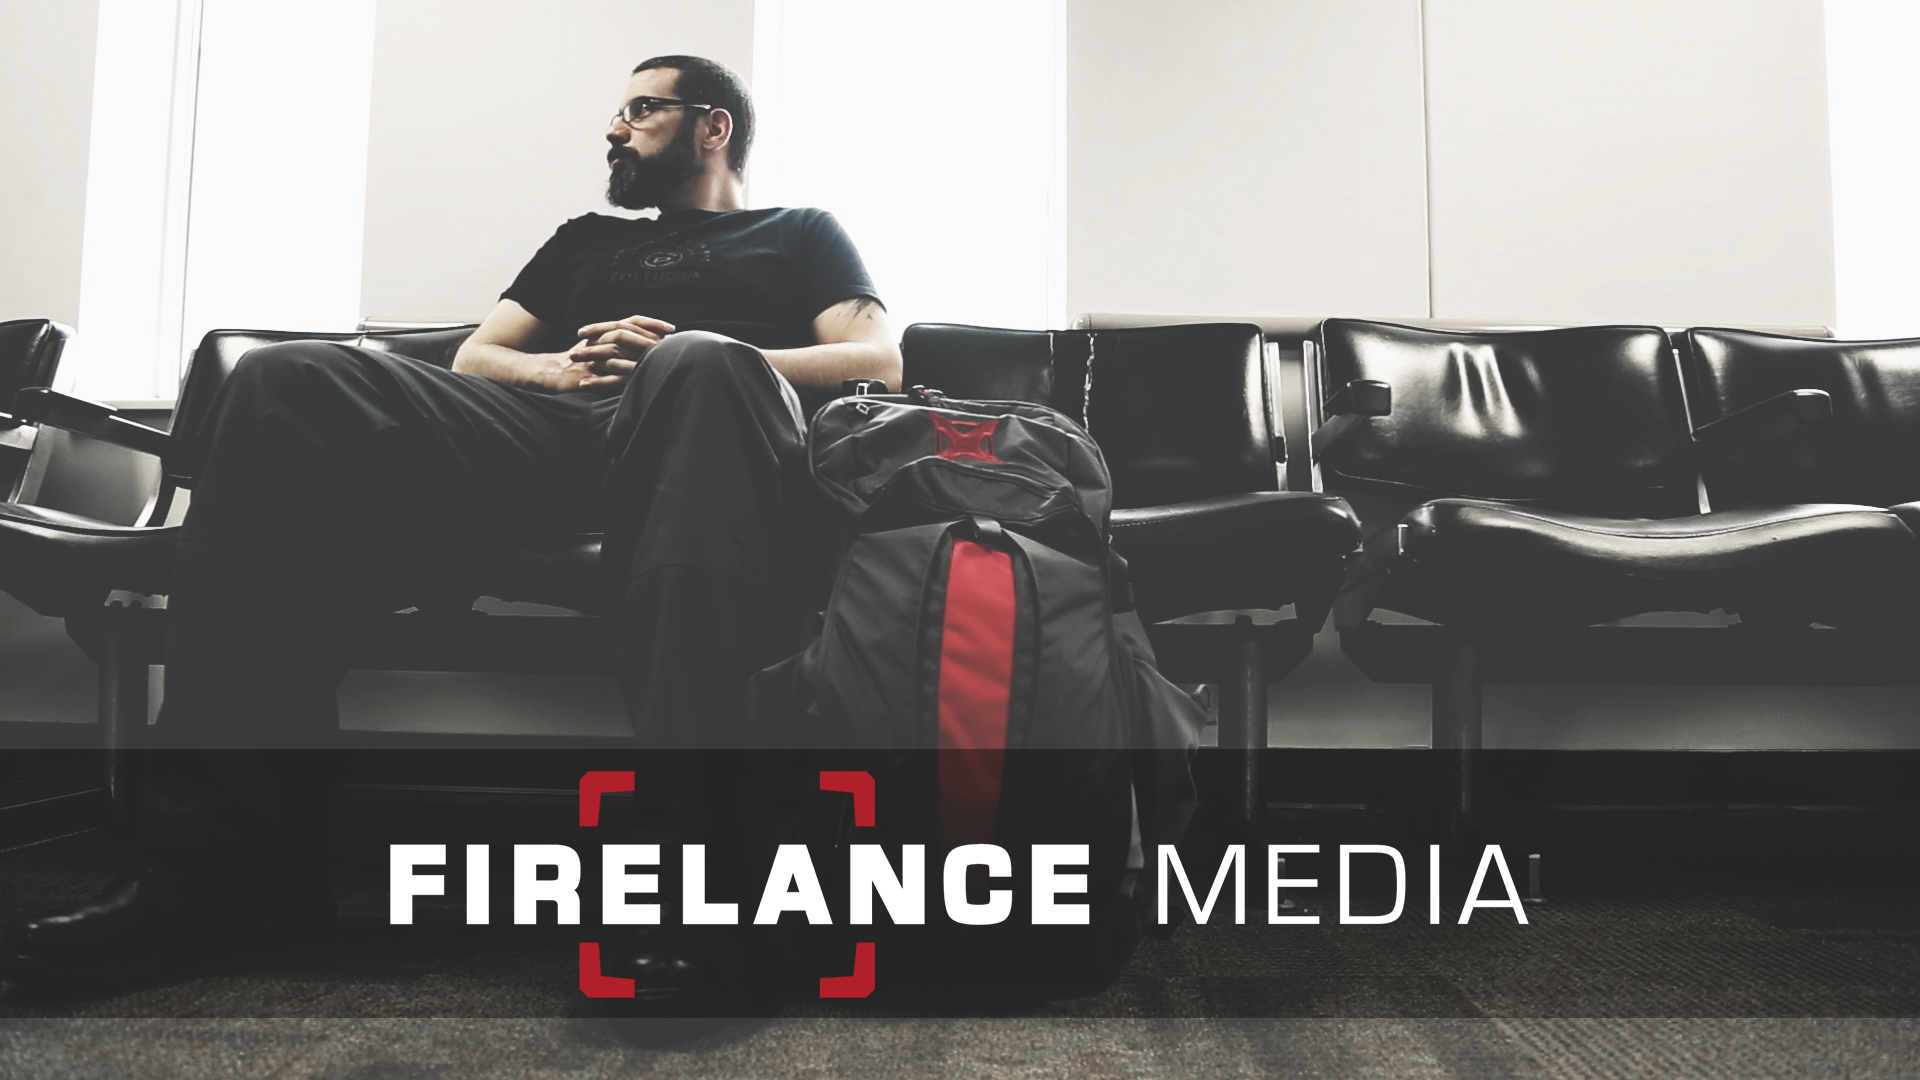 Home 1 - Firearms Photographer | Firelance Media